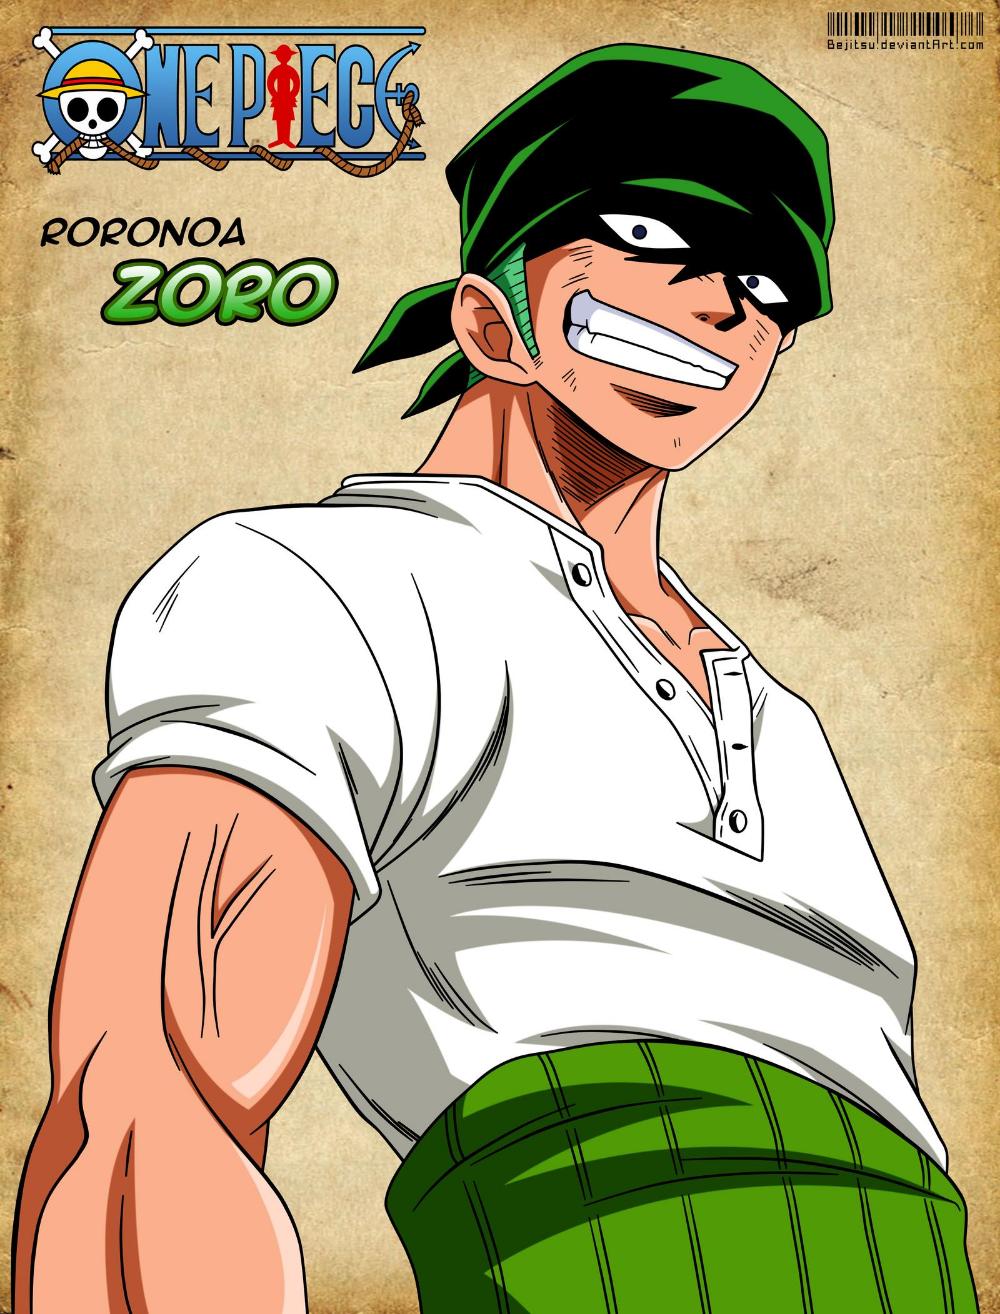 Roronoa Zoro by Bejitsu on DeviantArt em 2020 Animes